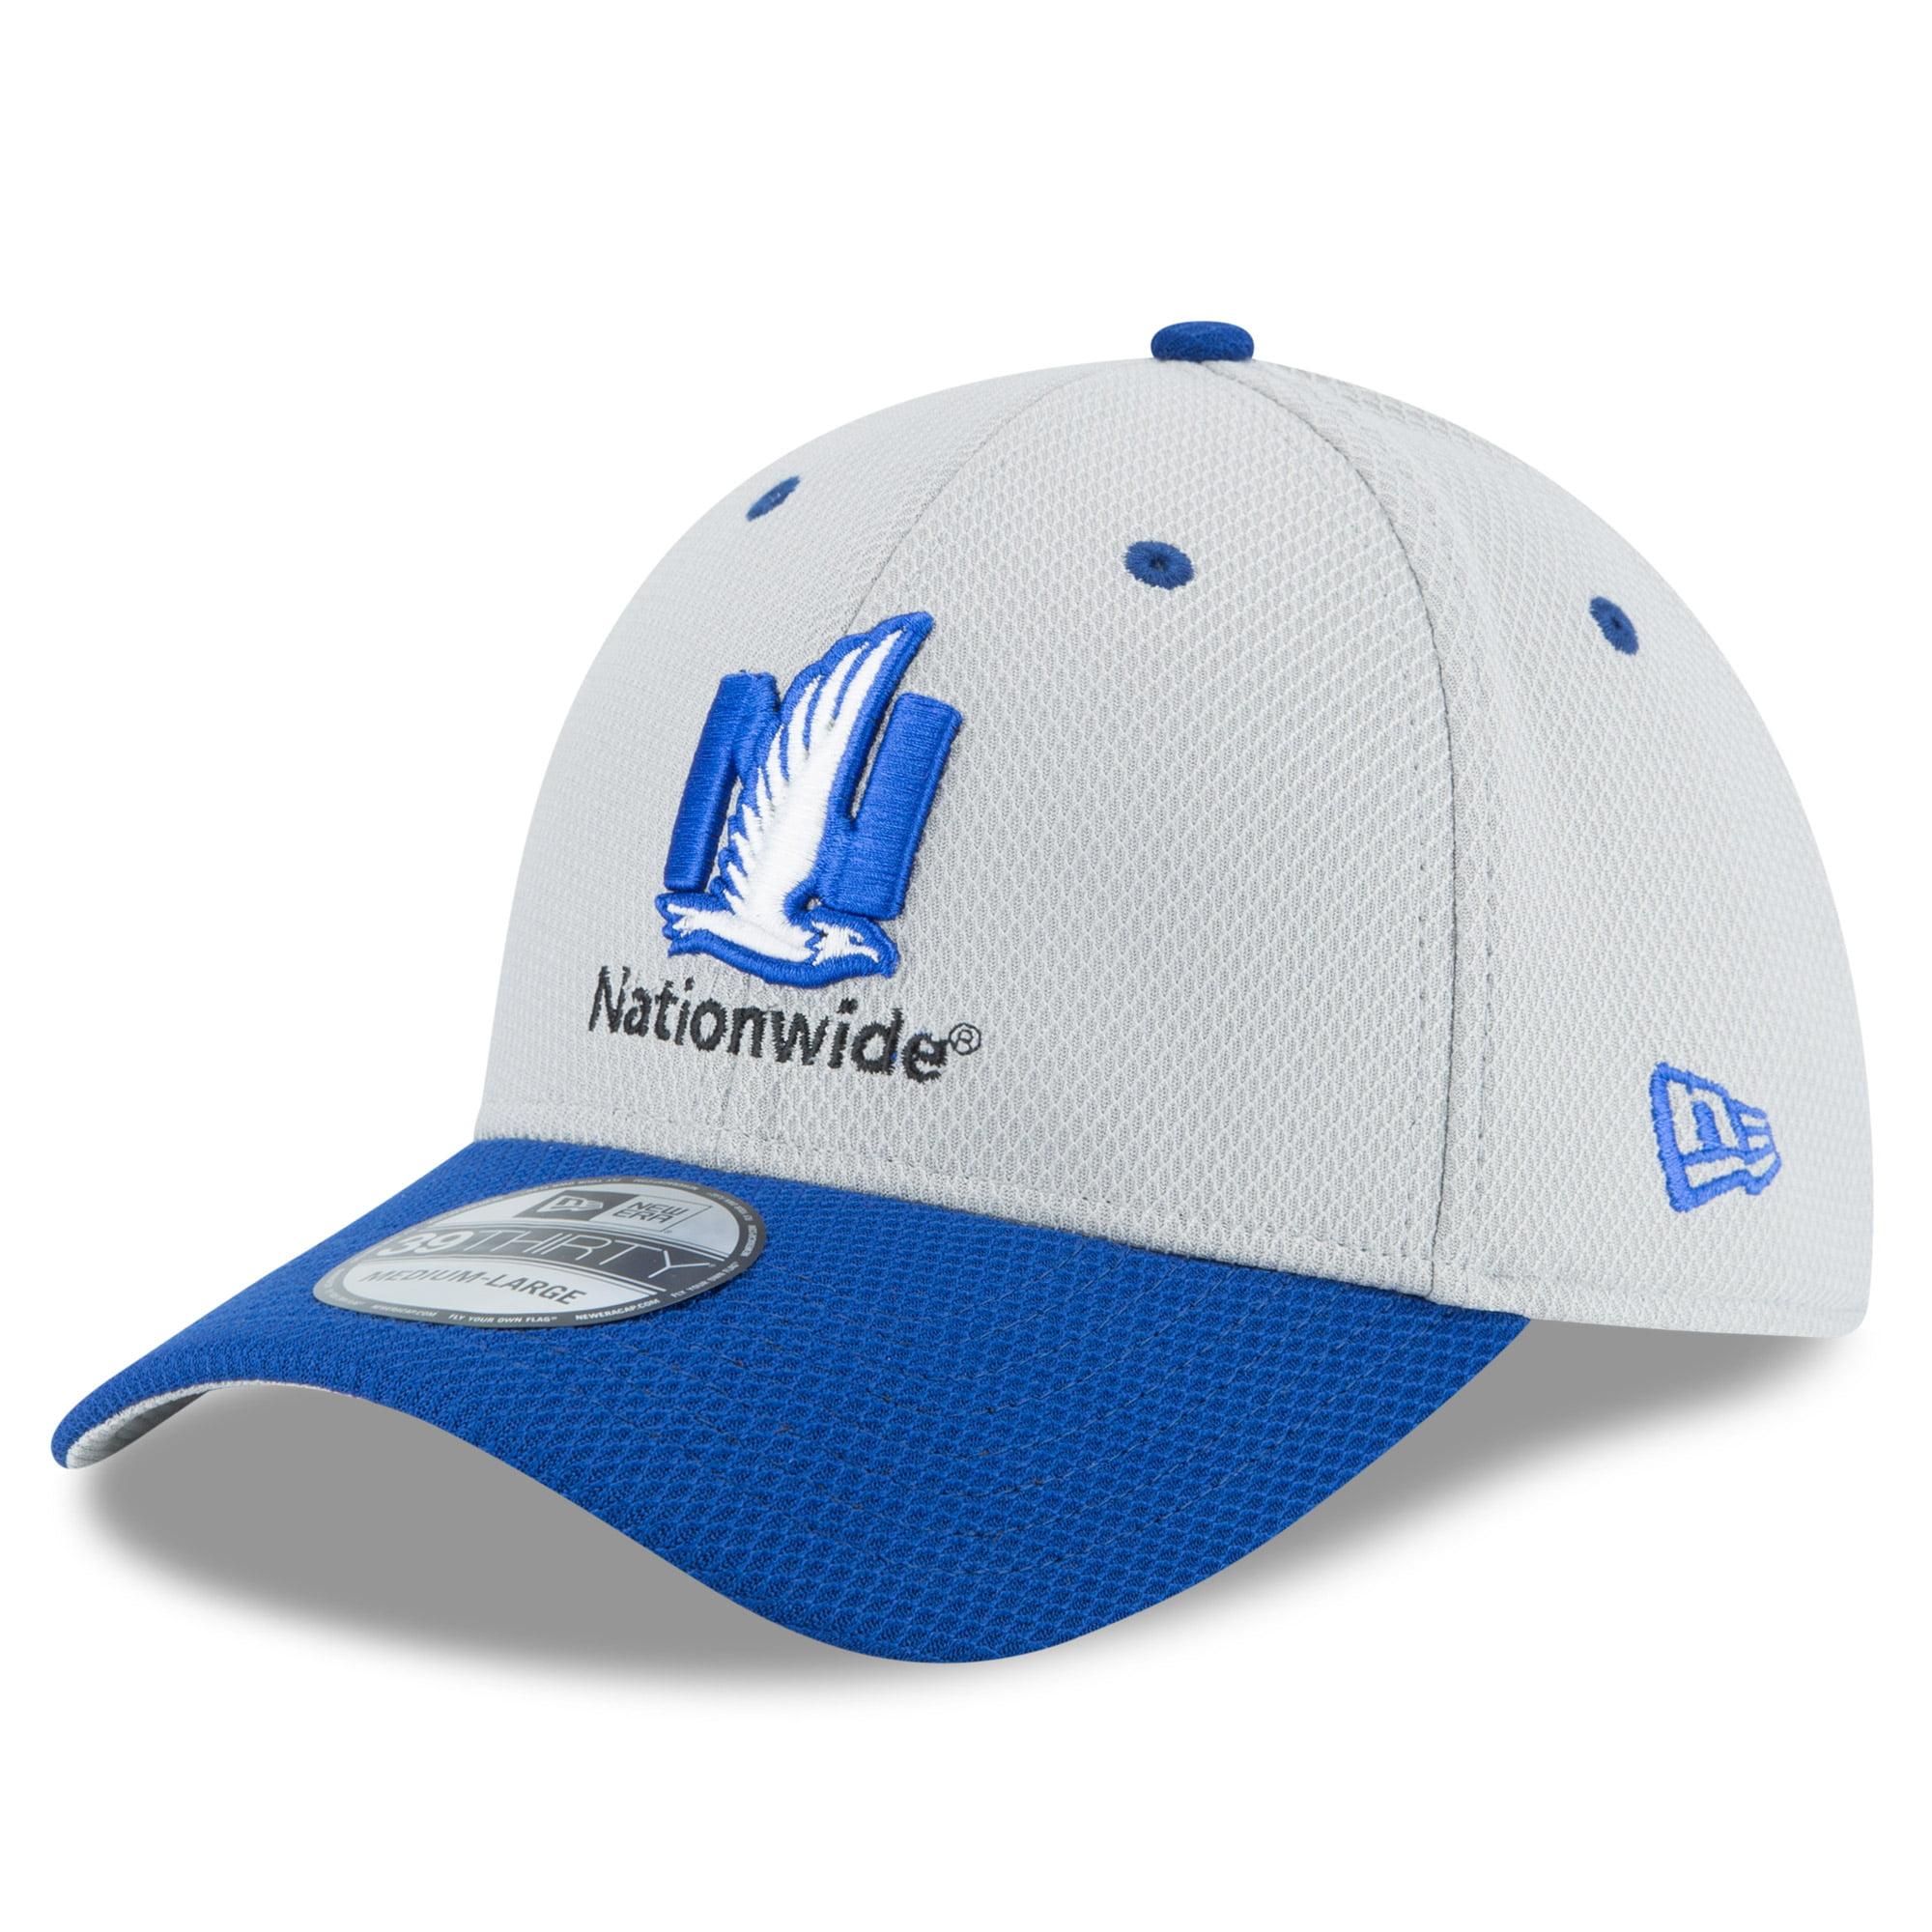 Dale Earnhardt Jr. New Era Nationwide Driver 39THIRTY Flex Hat - Gray